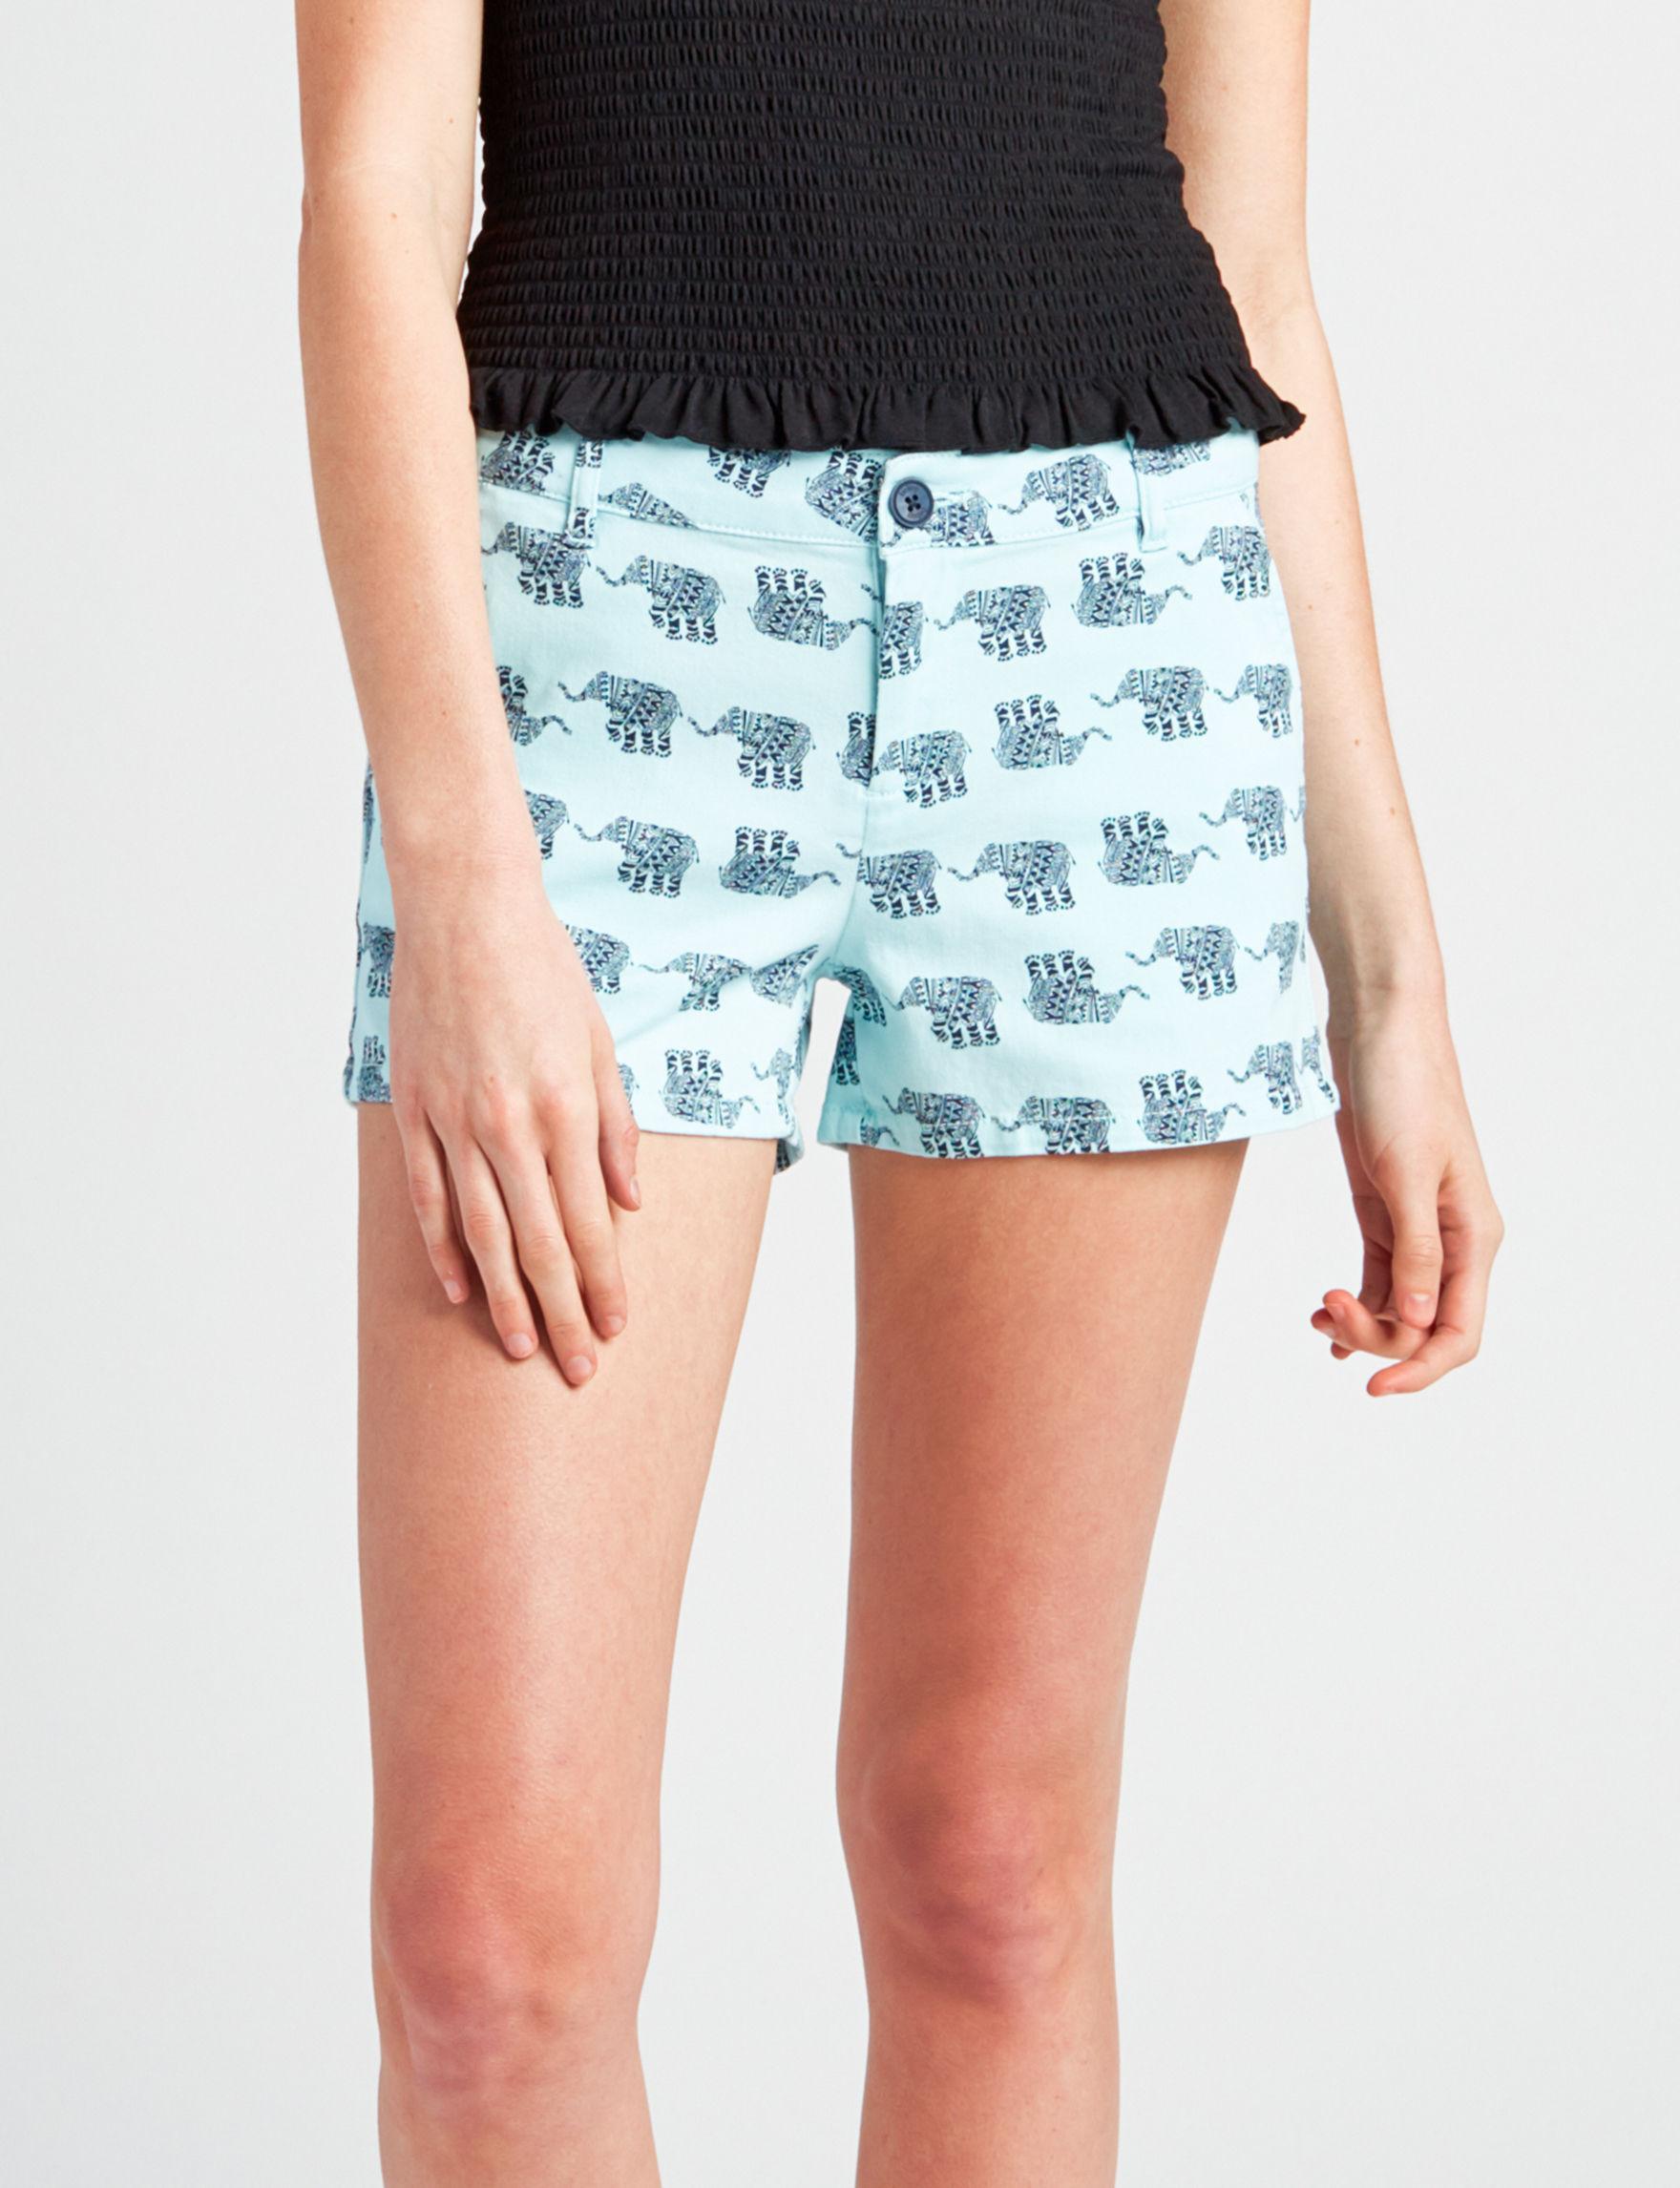 BeBop Blue Tailored Shorts